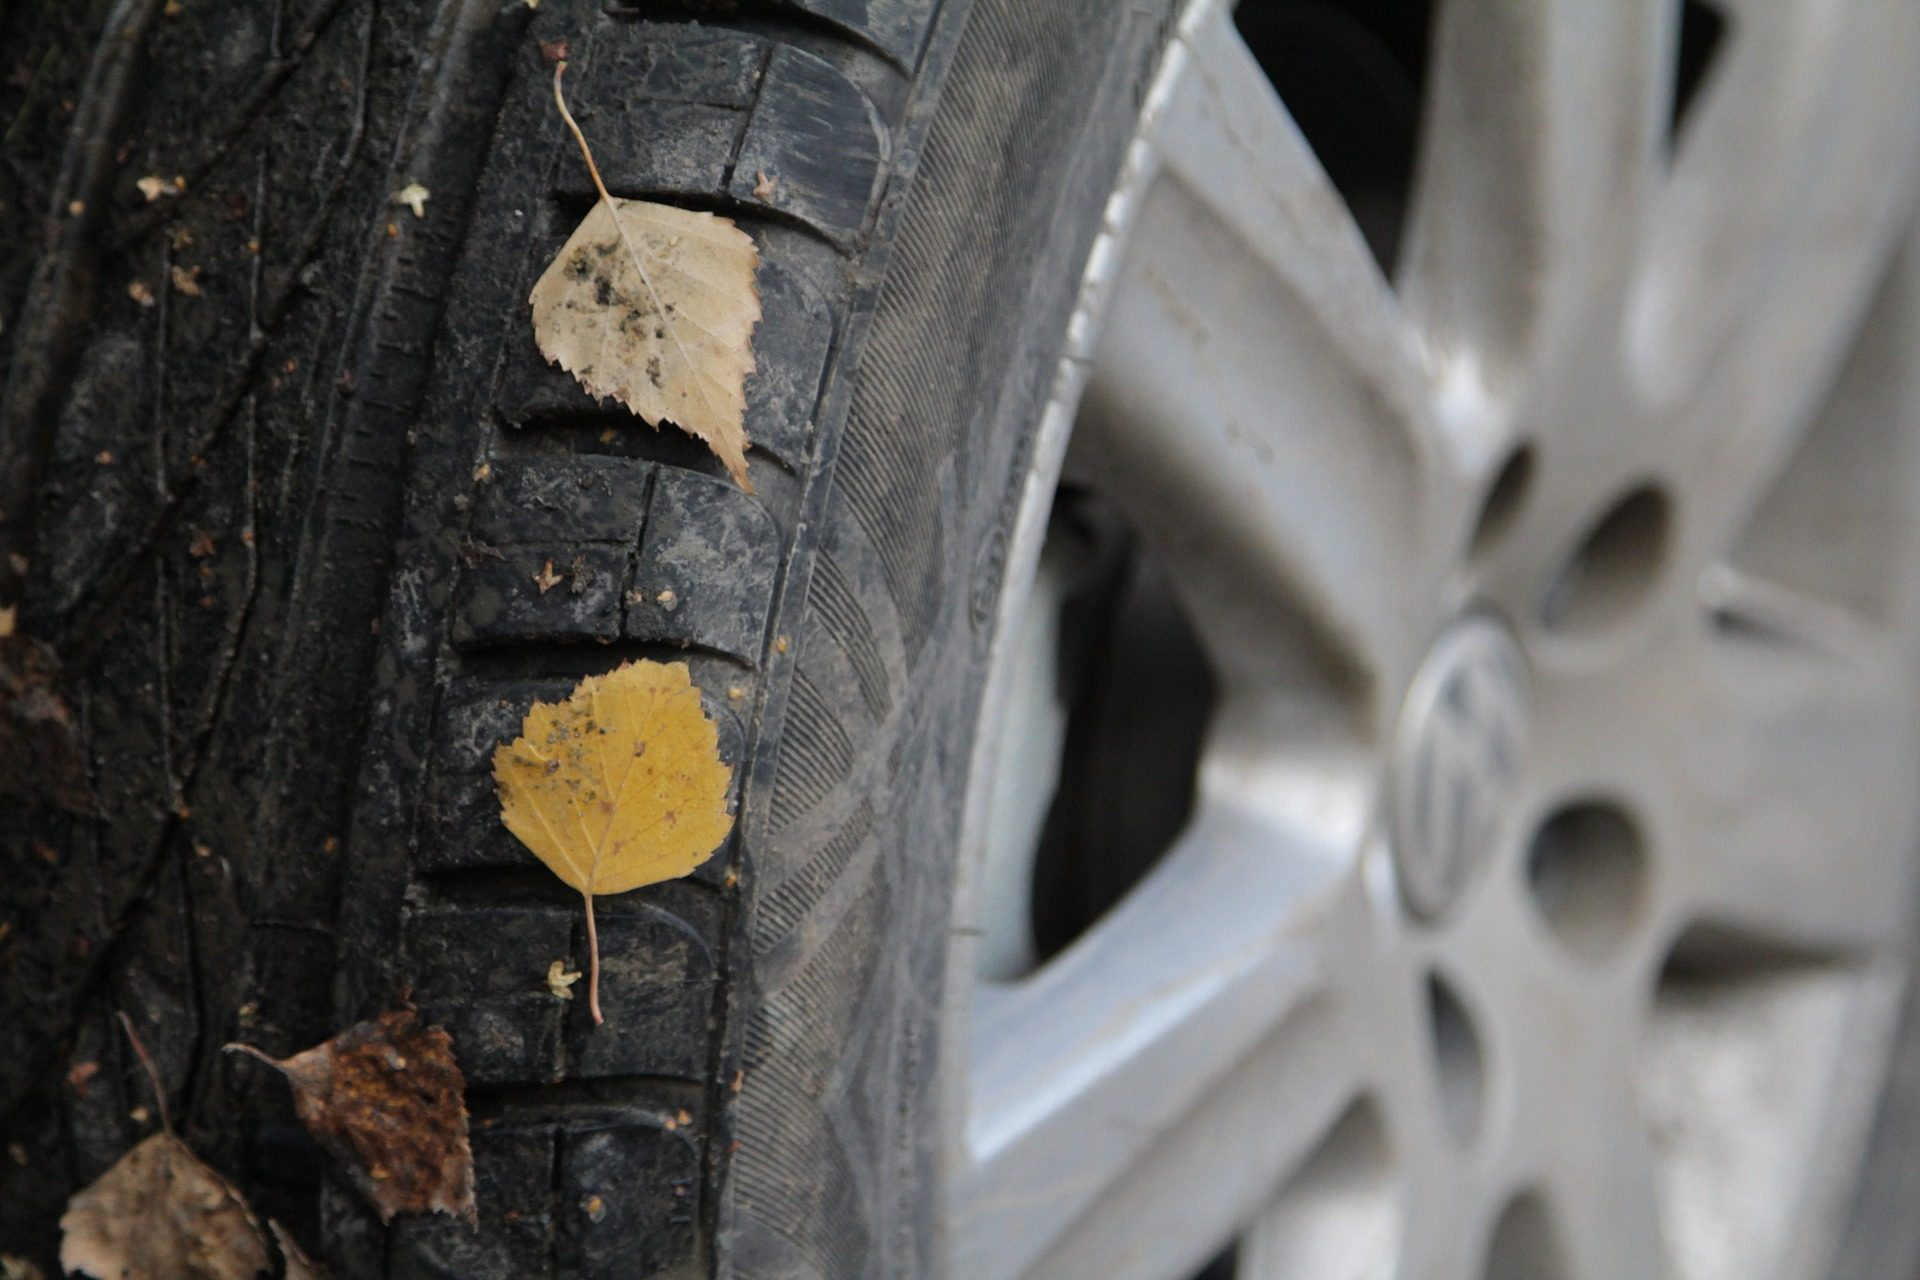 rueda, neumático, goma, caucho, metal, hojas - Fondos de Pantalla HD - professor-falken.com